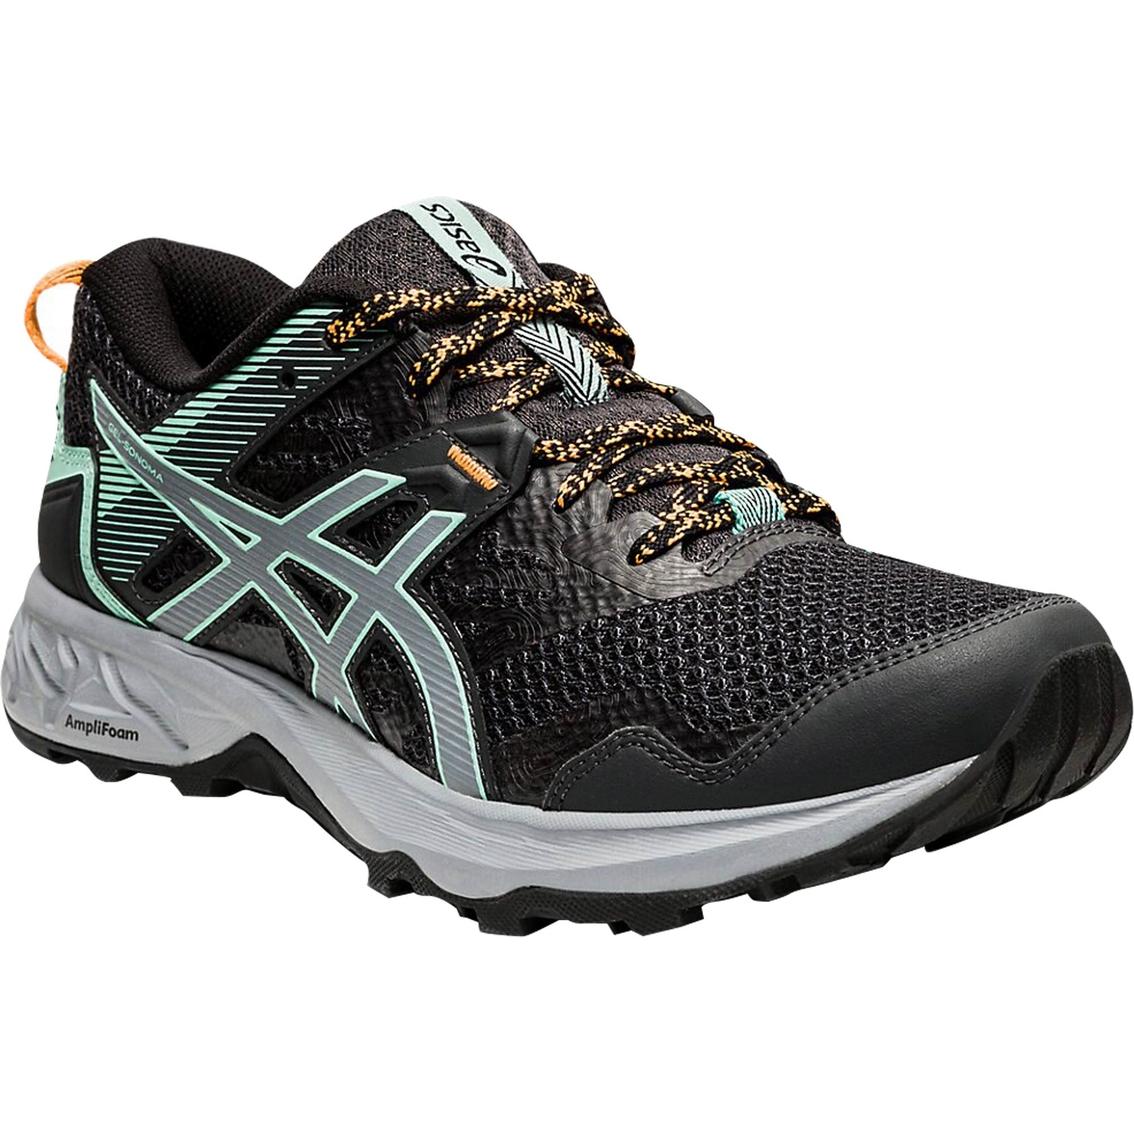 Asics Women's Gel Sonoma 5 Trail Running Shoes | Running | Back To ...